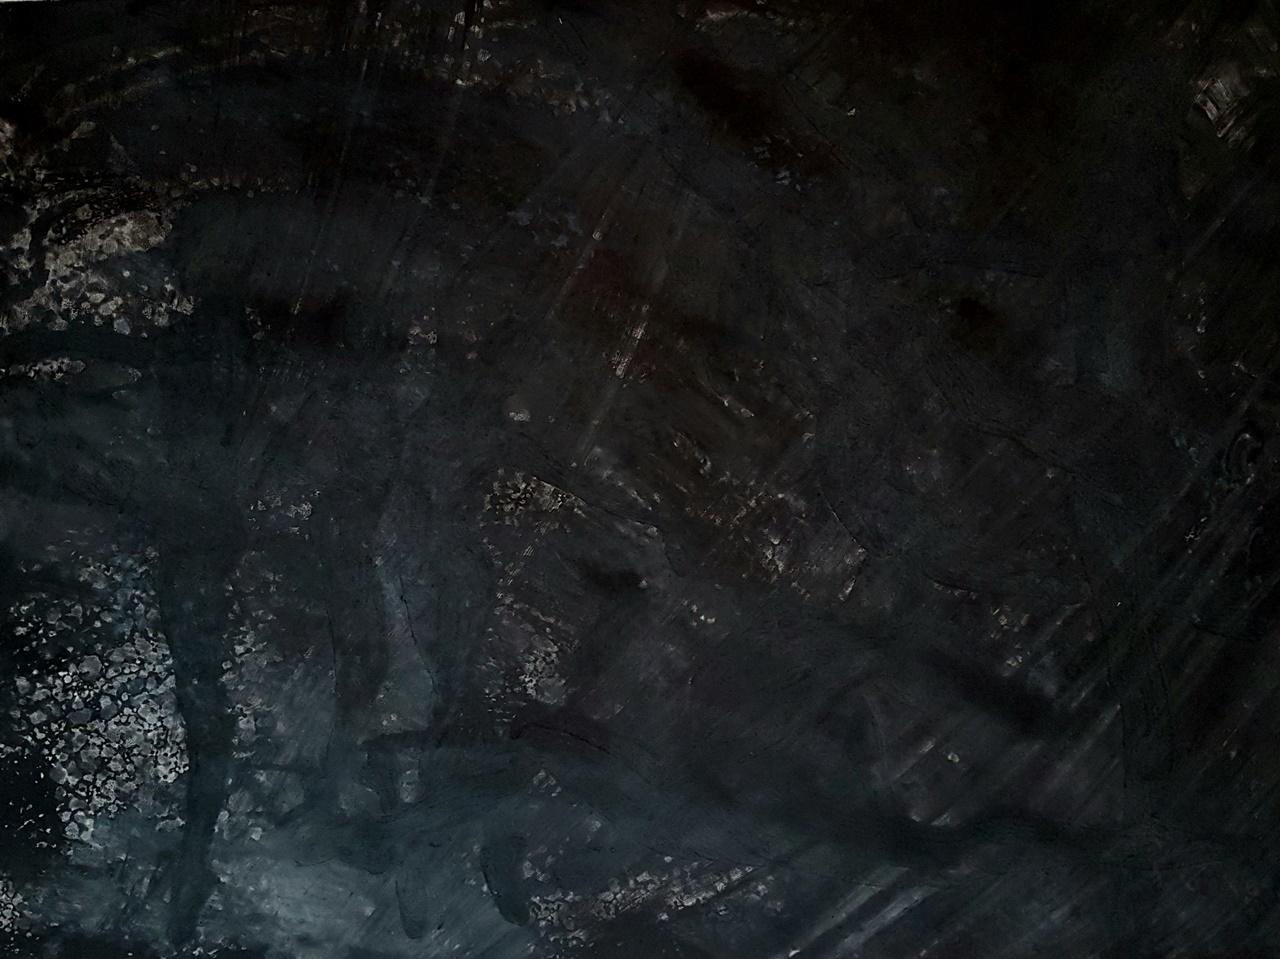 Abstraction 110223 - Ειρήνη Ράπτη Χαράκτης